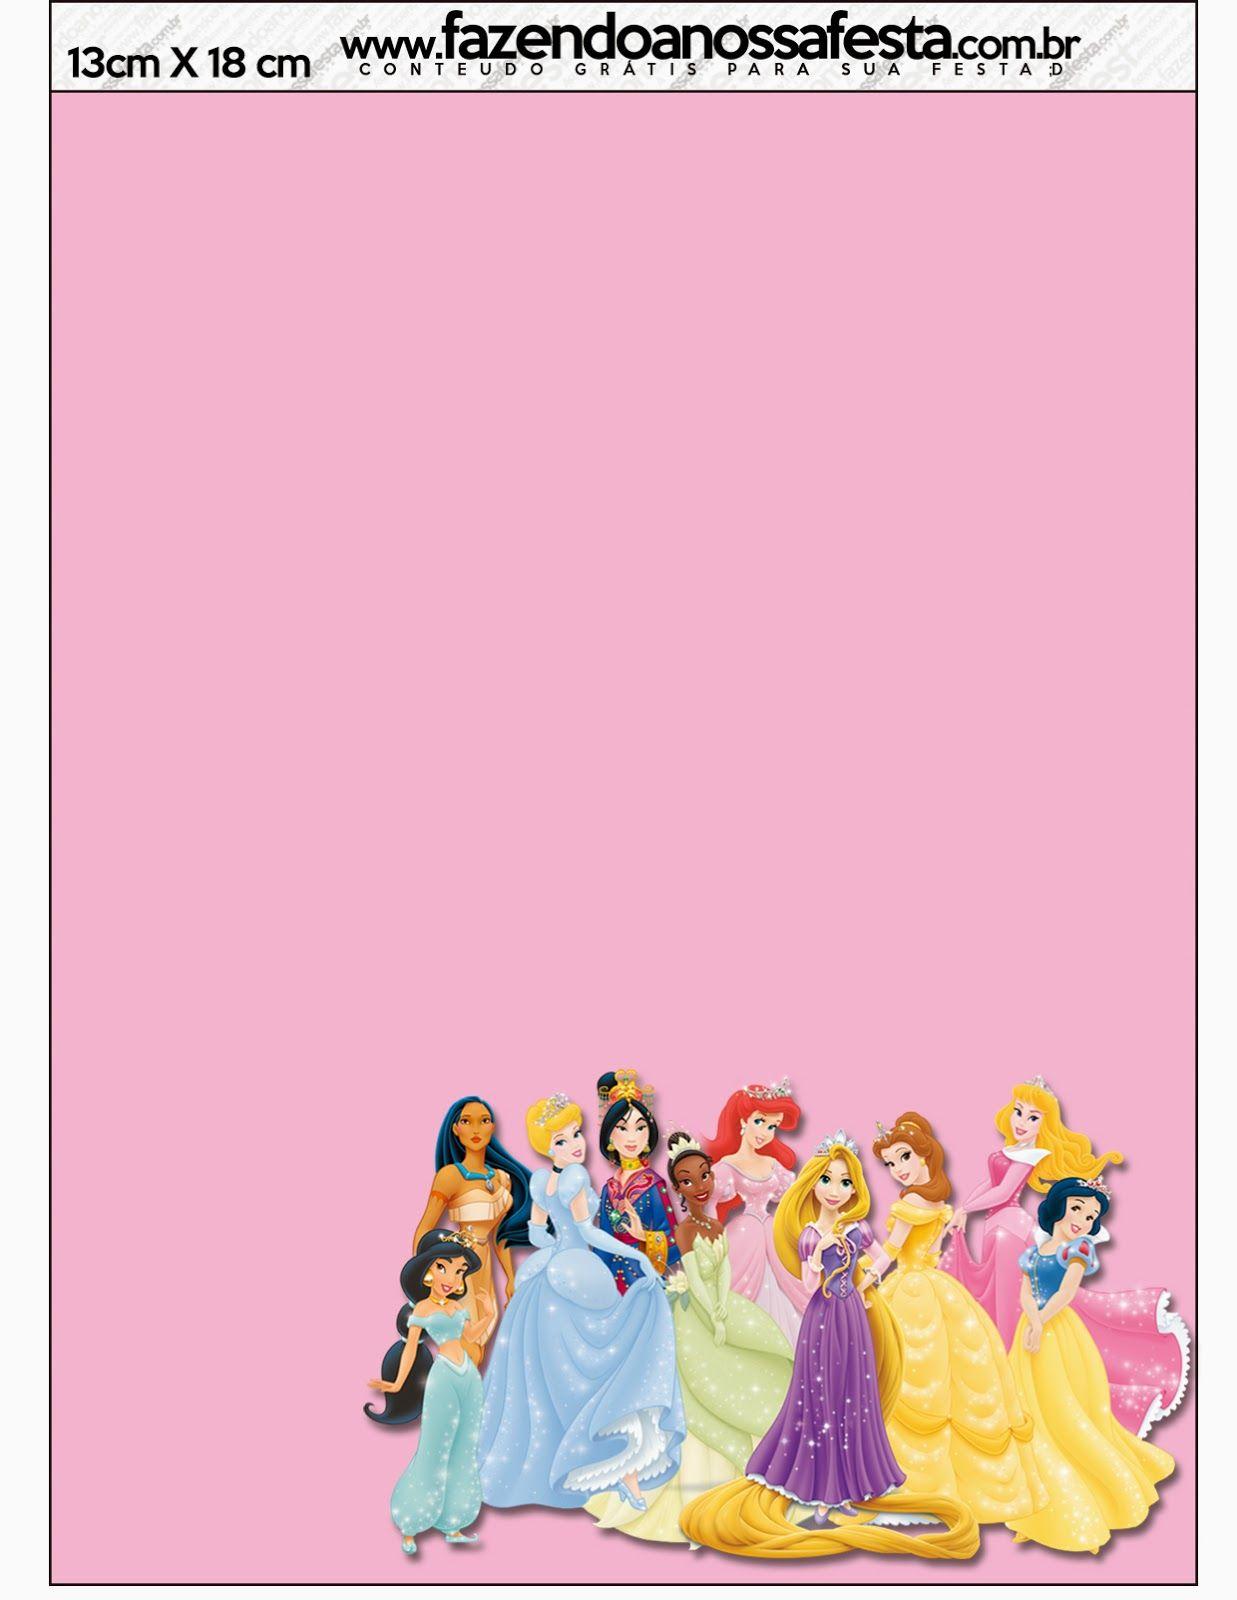 Disney Princess: Free Printable Party Invitations. | birthday ...